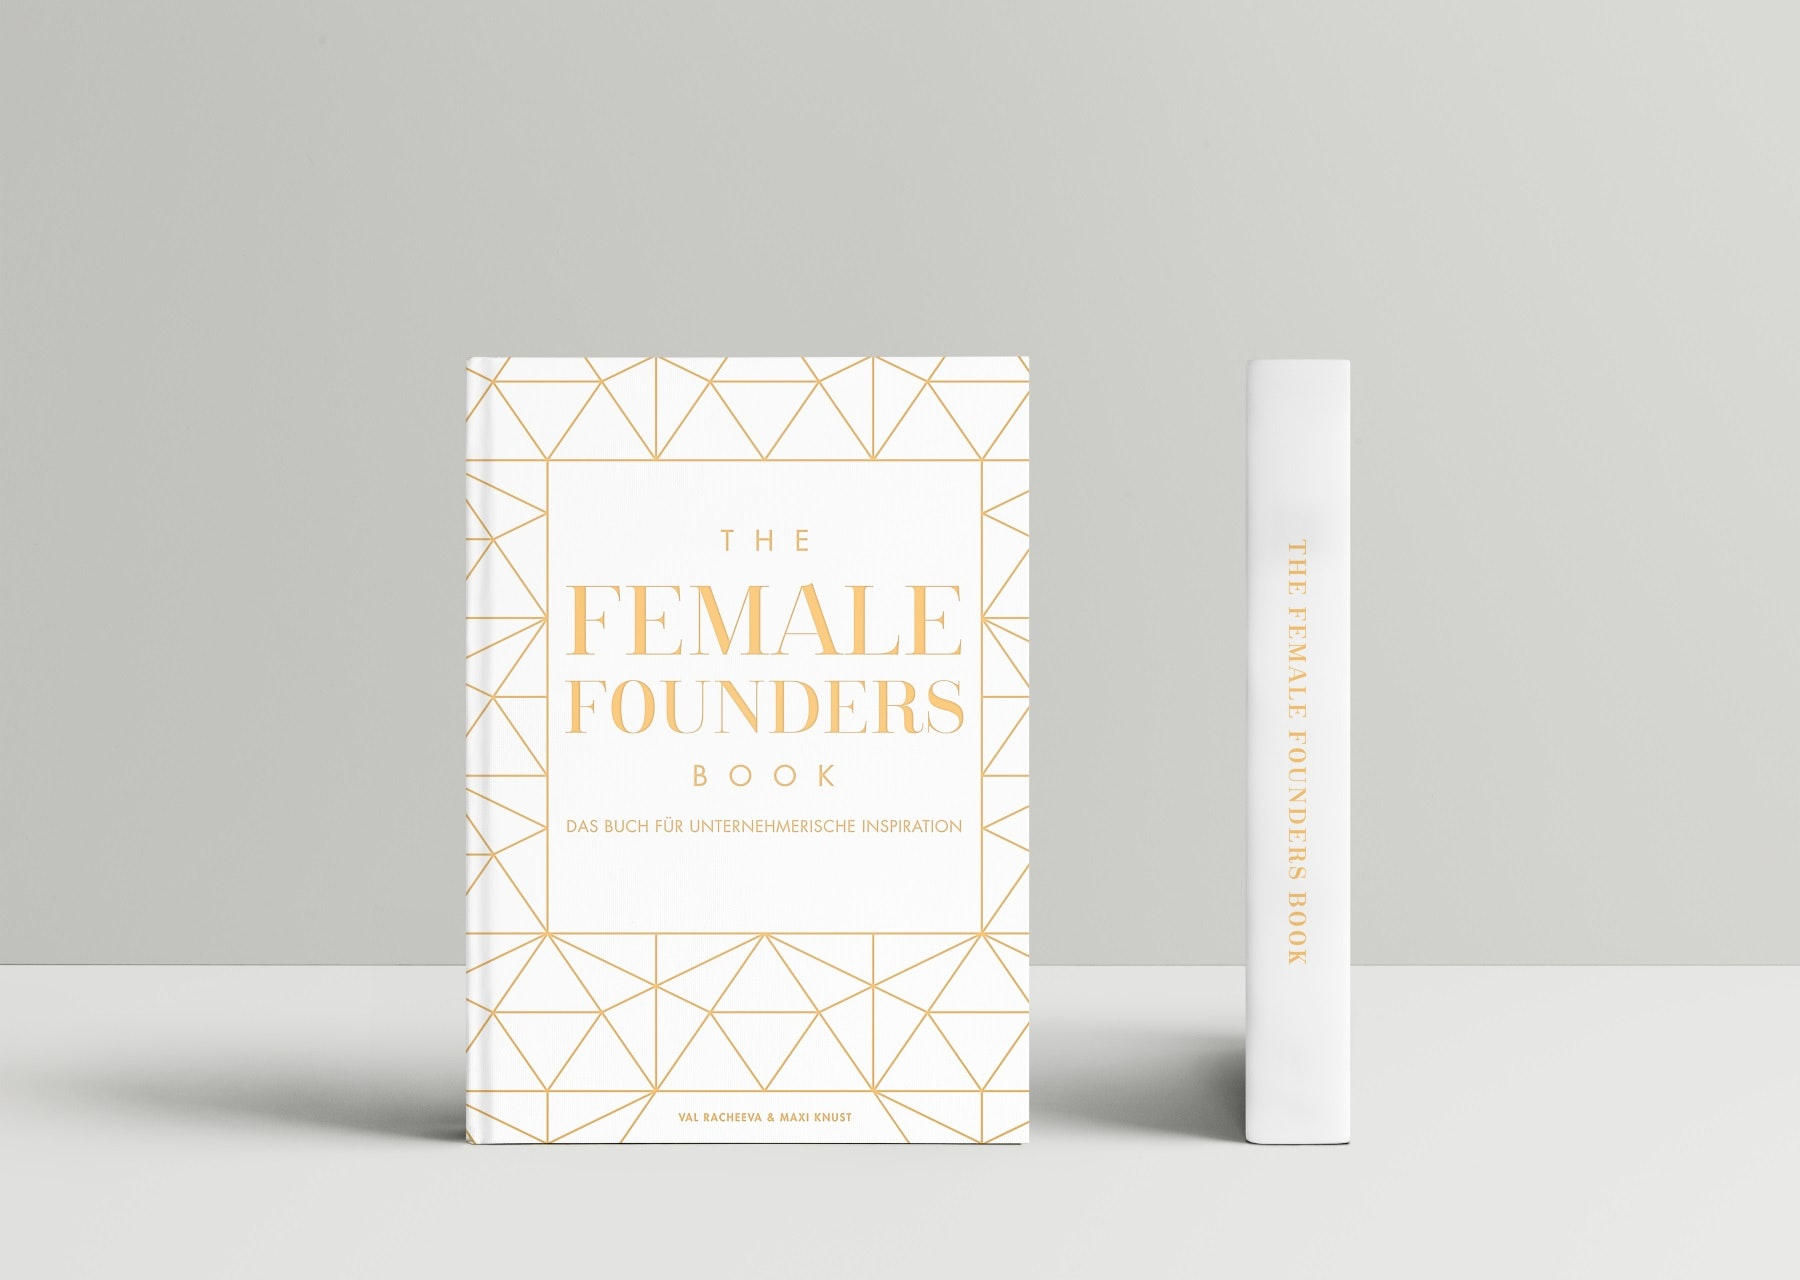 Buchcover von The Female Founders Book